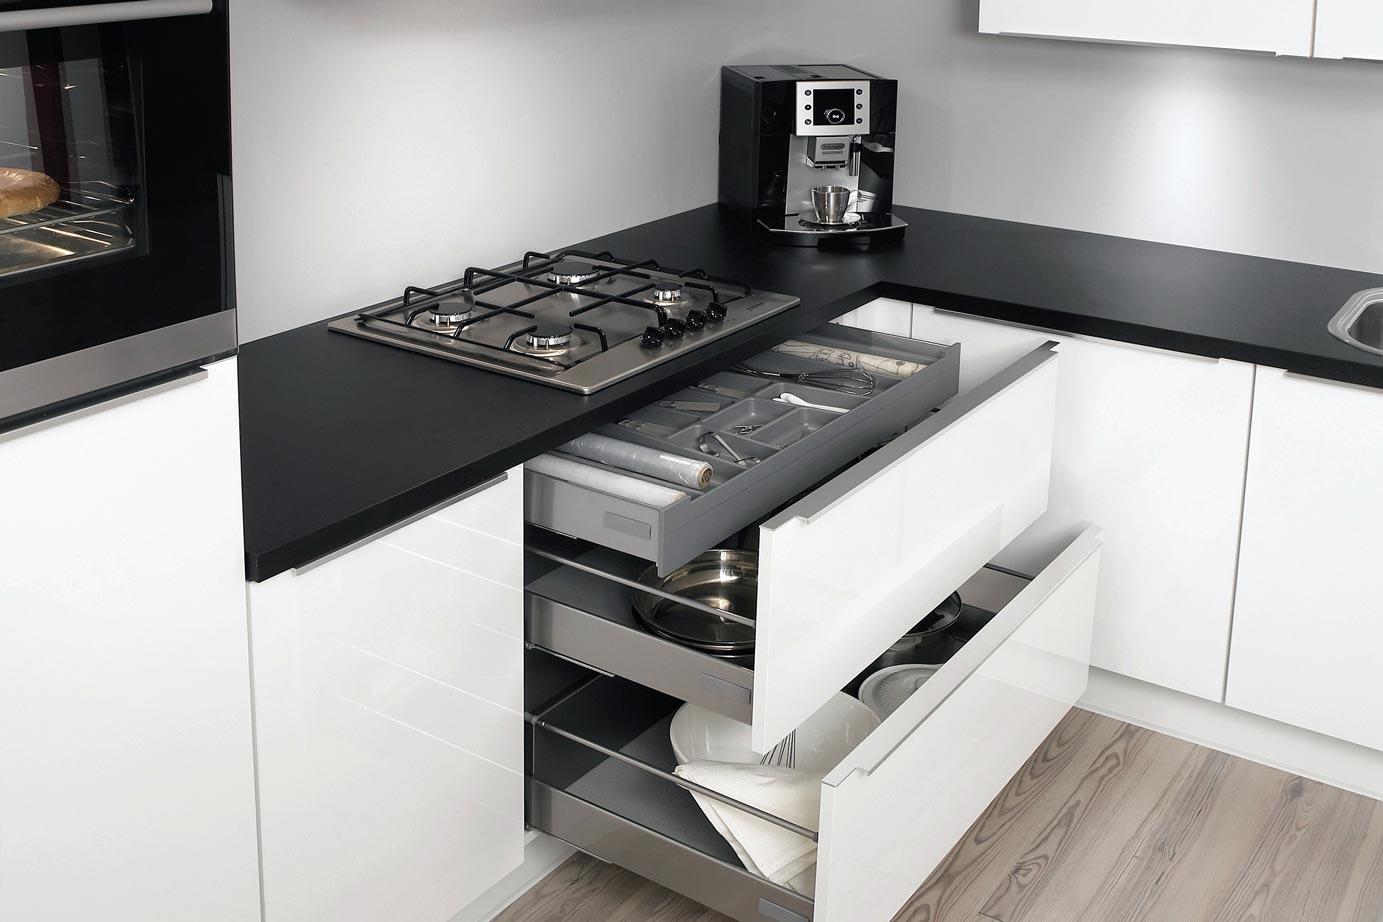 Keuken Hoogglans Wit Of Mat : hoogglans keukens u kunt uw moderne keuken ook nog in super hoogglans